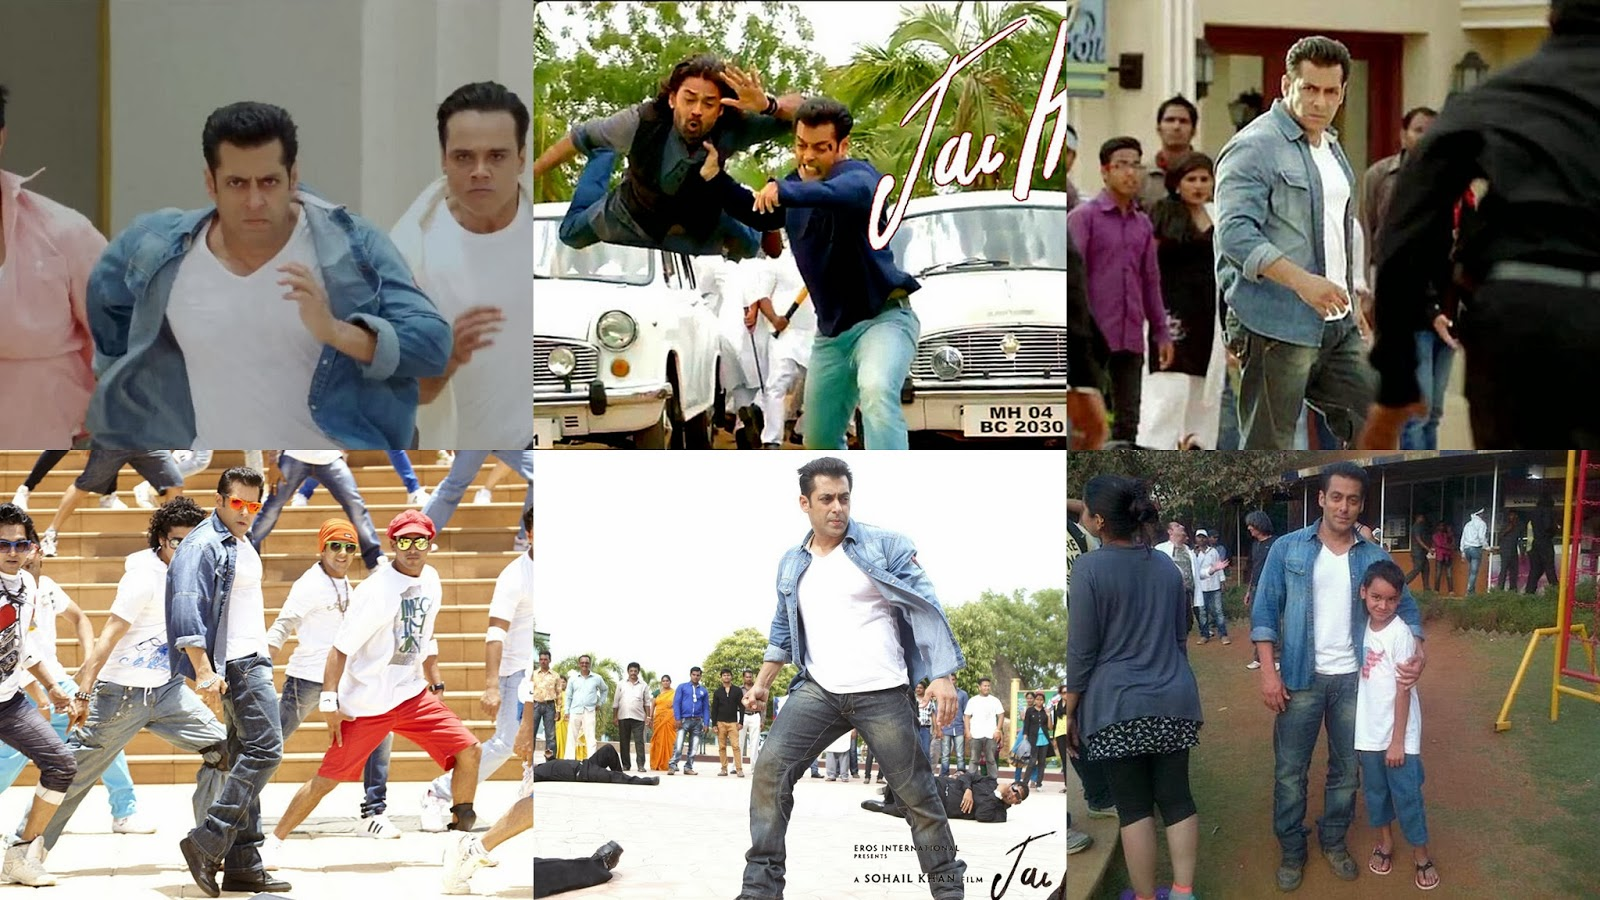 Salman Khan shooting for Jai Ho movie